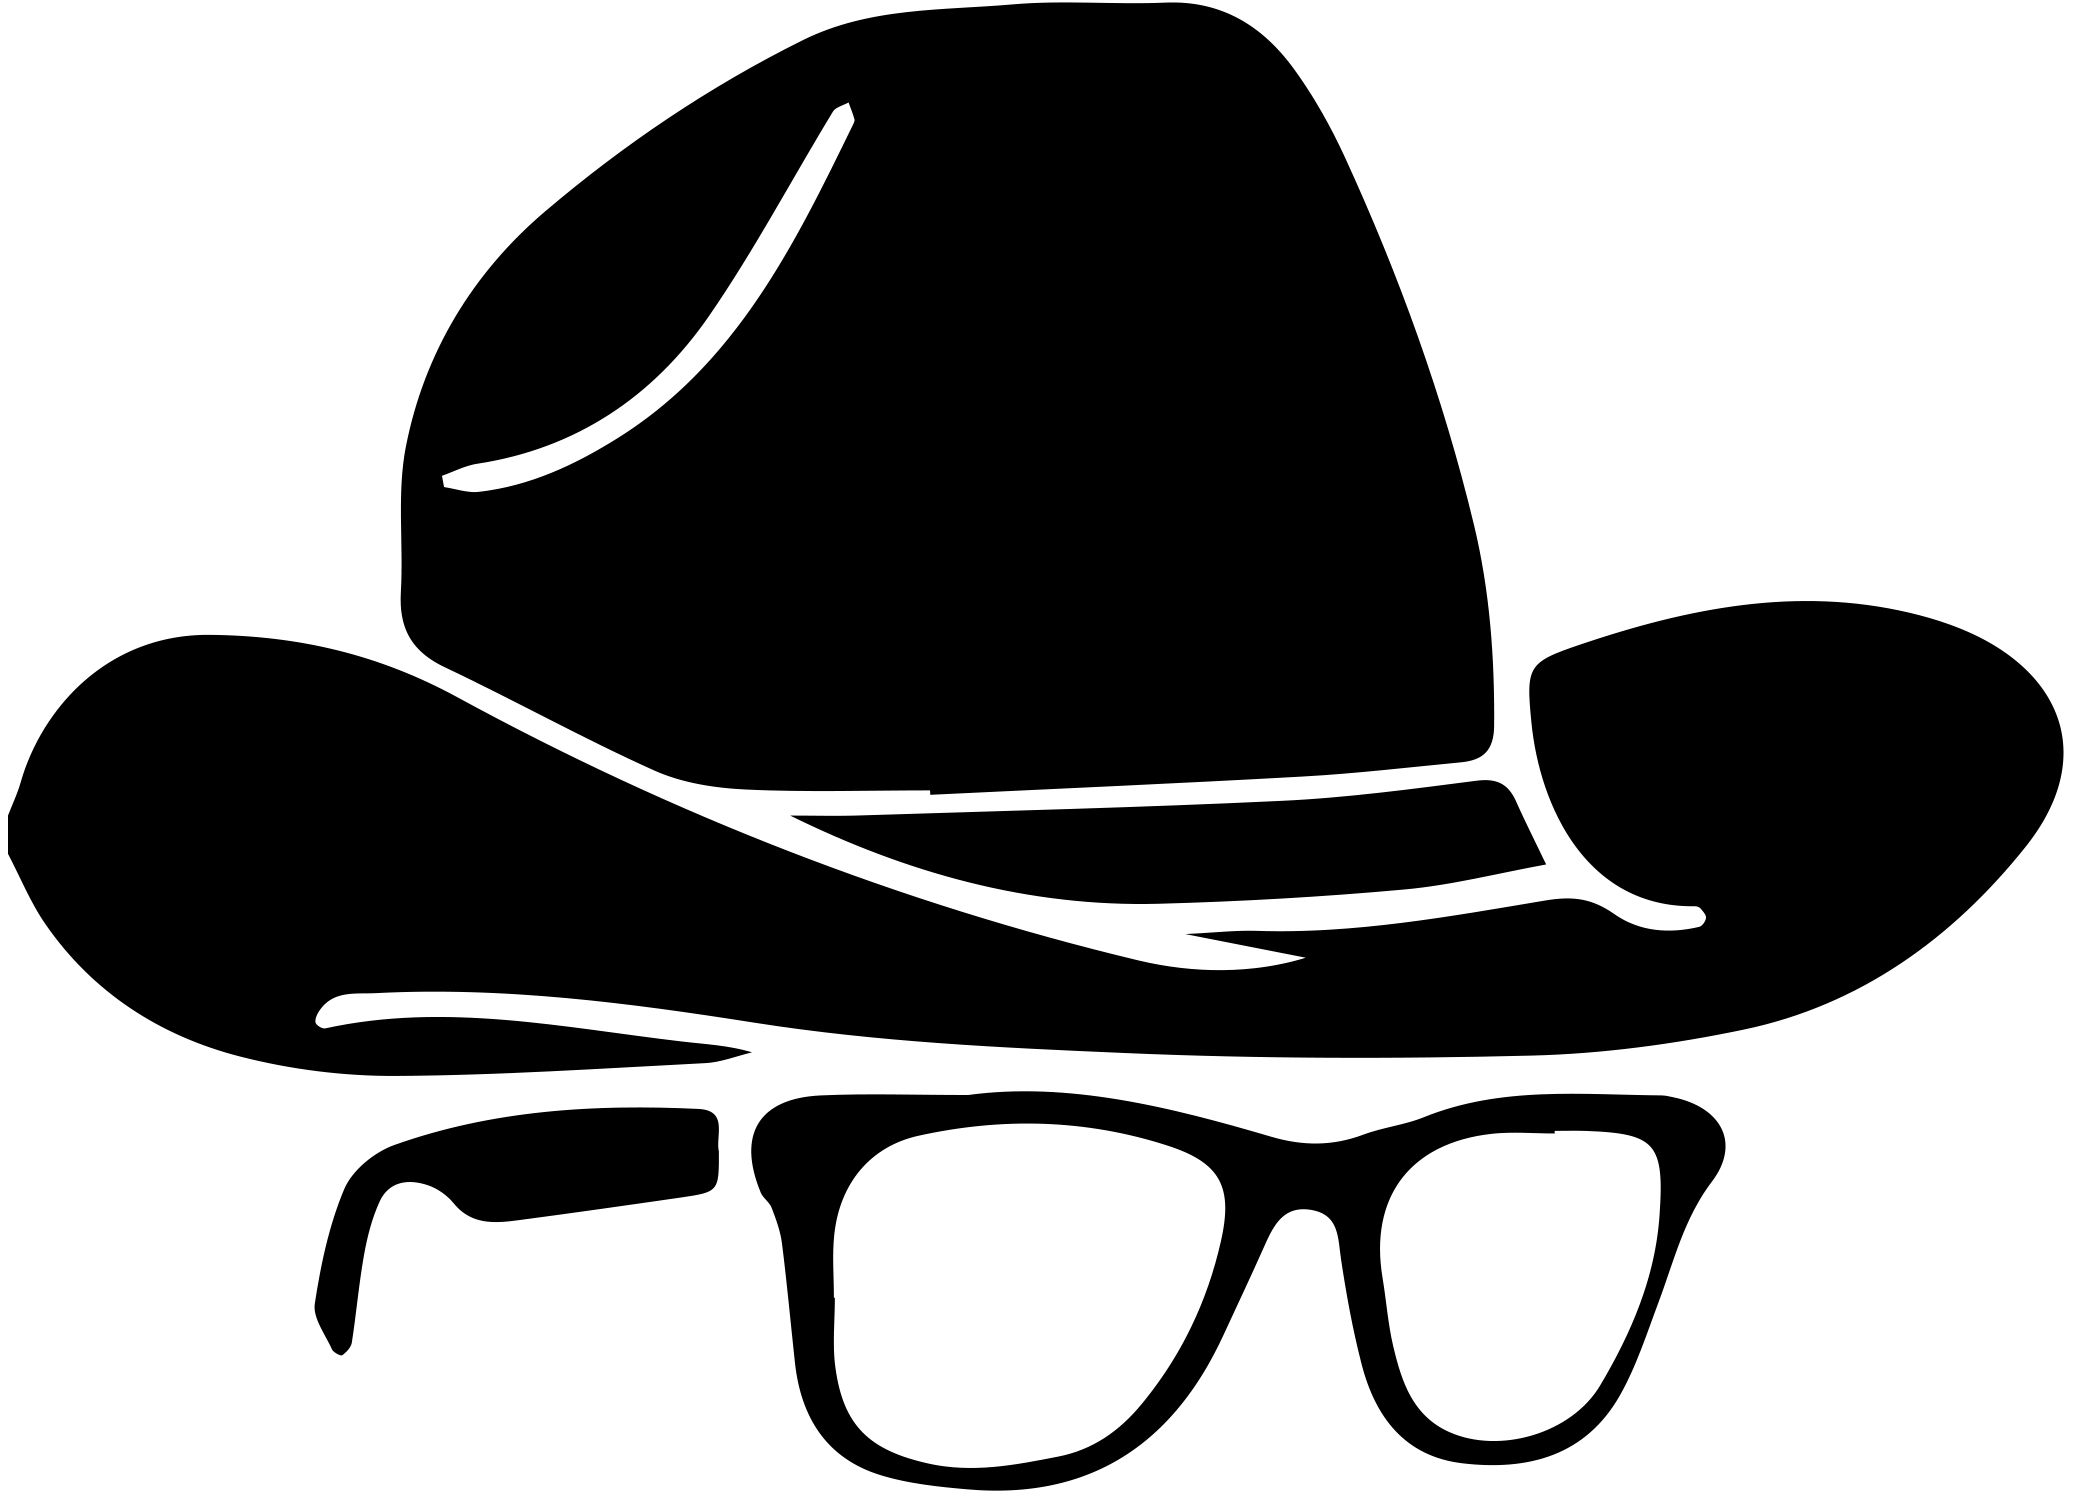 Gun io - Low-Level Sr  Android Developer [Android 9, SELinux, TPIO, I2C]